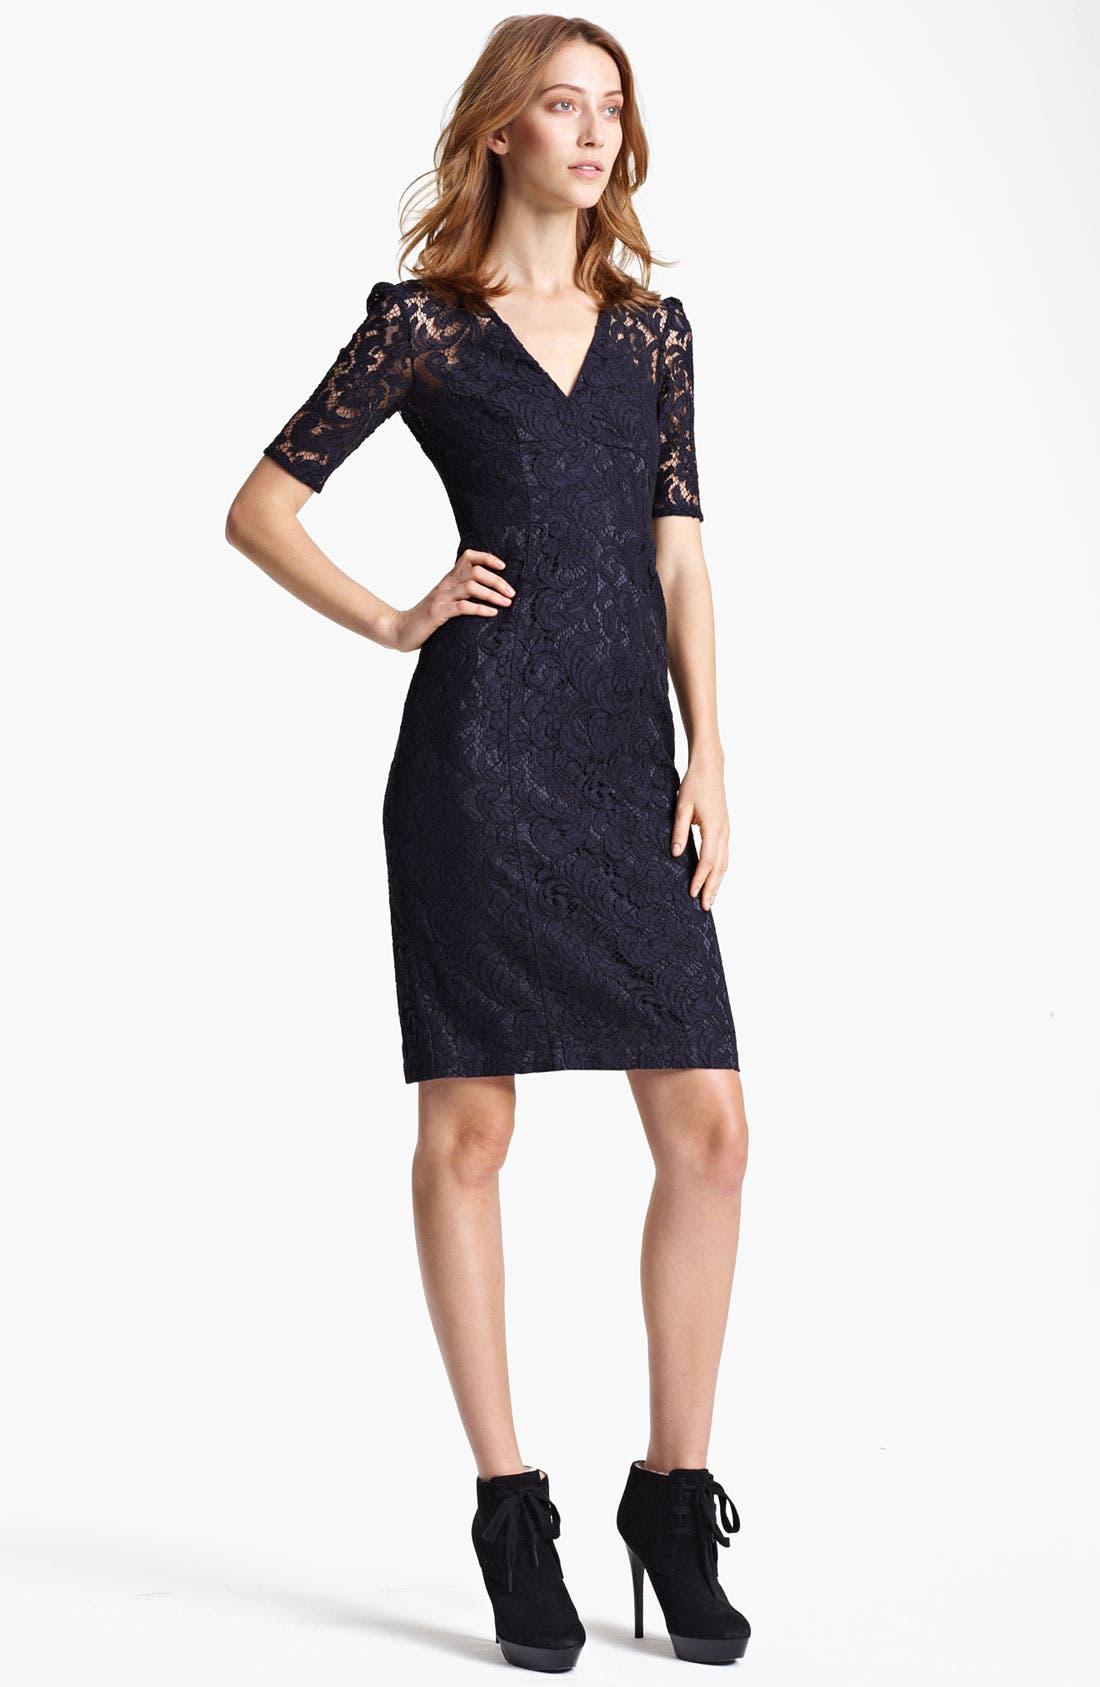 Main Image - Burberry London Lace Dress